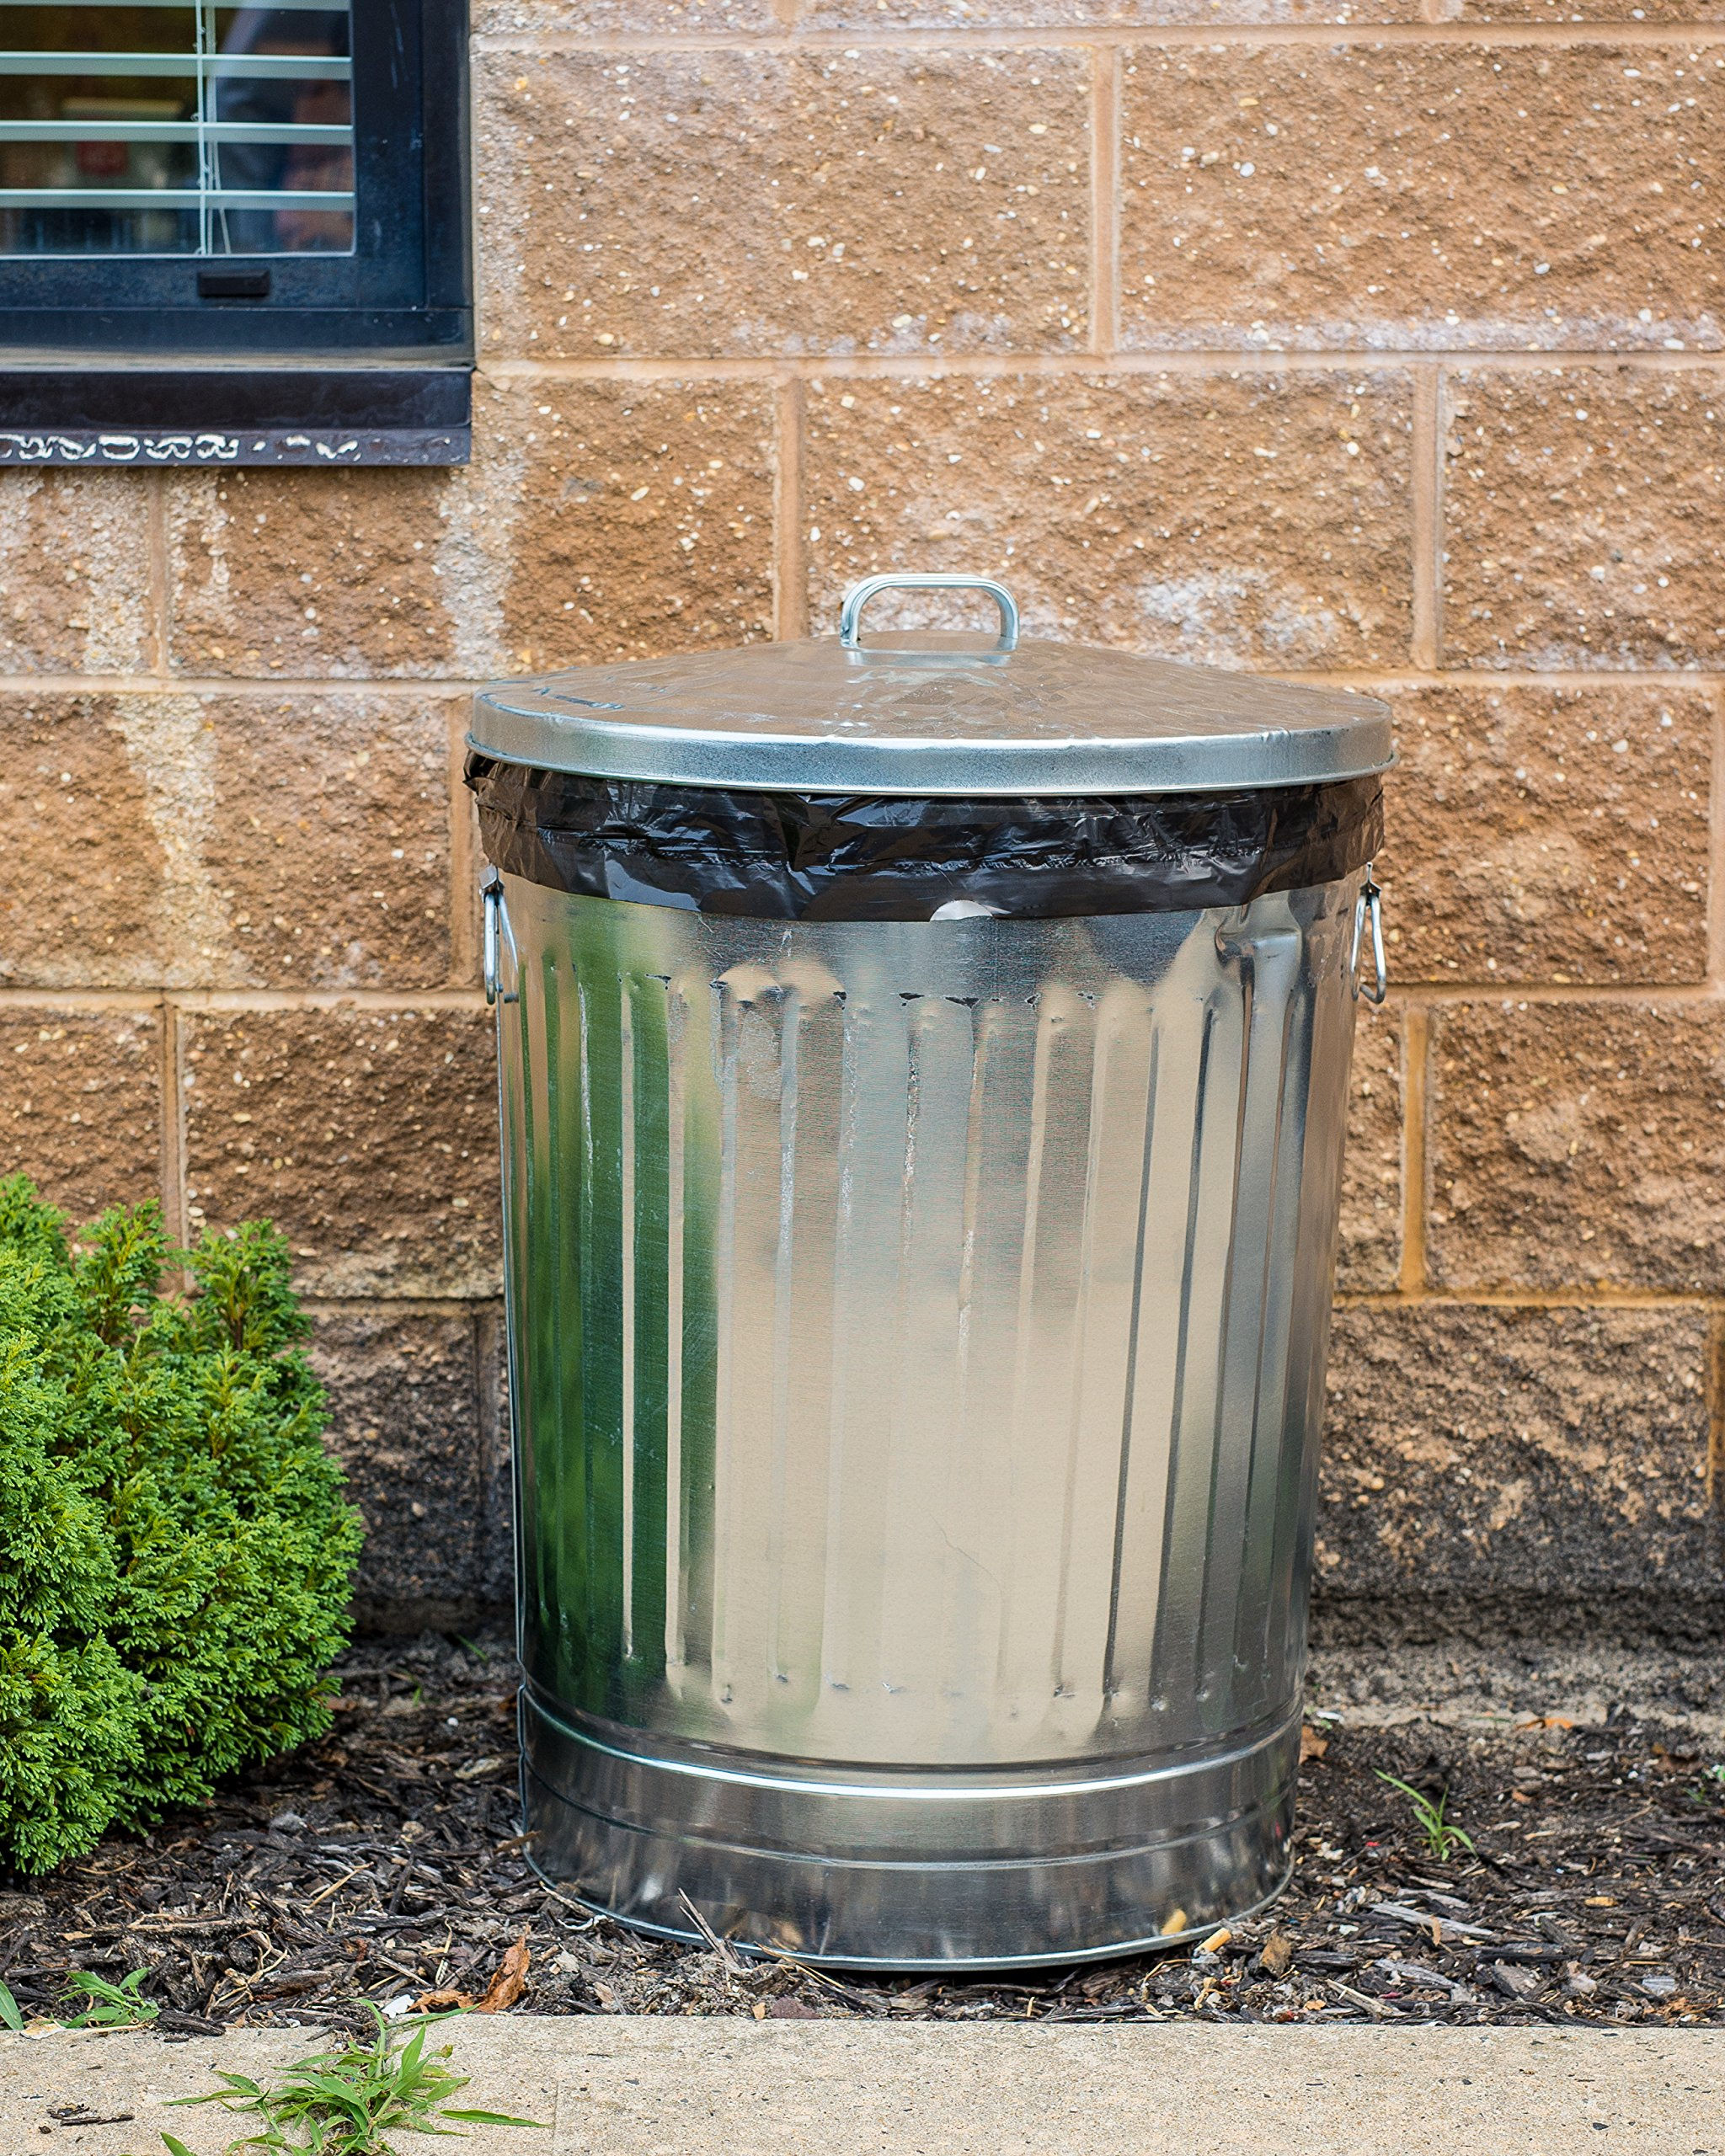 Plasticplace 35 Gallon Trash Bags, 1.5 Mil, 33''W x 48''H, Black, 100 / Case by Plasticplace